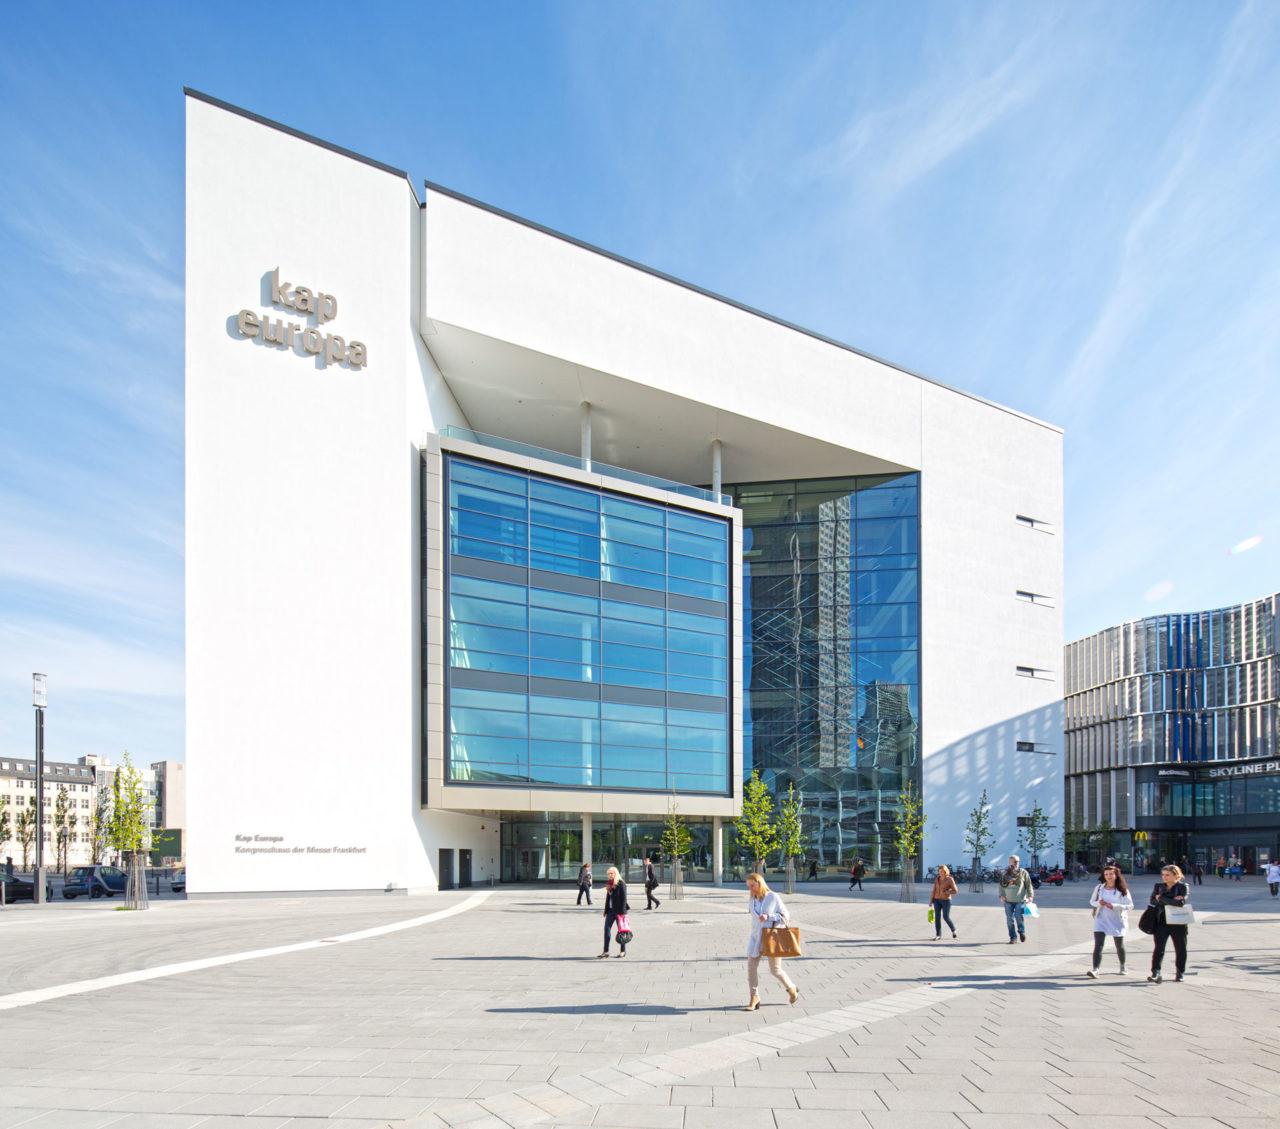 KAP Europa Frankfurt